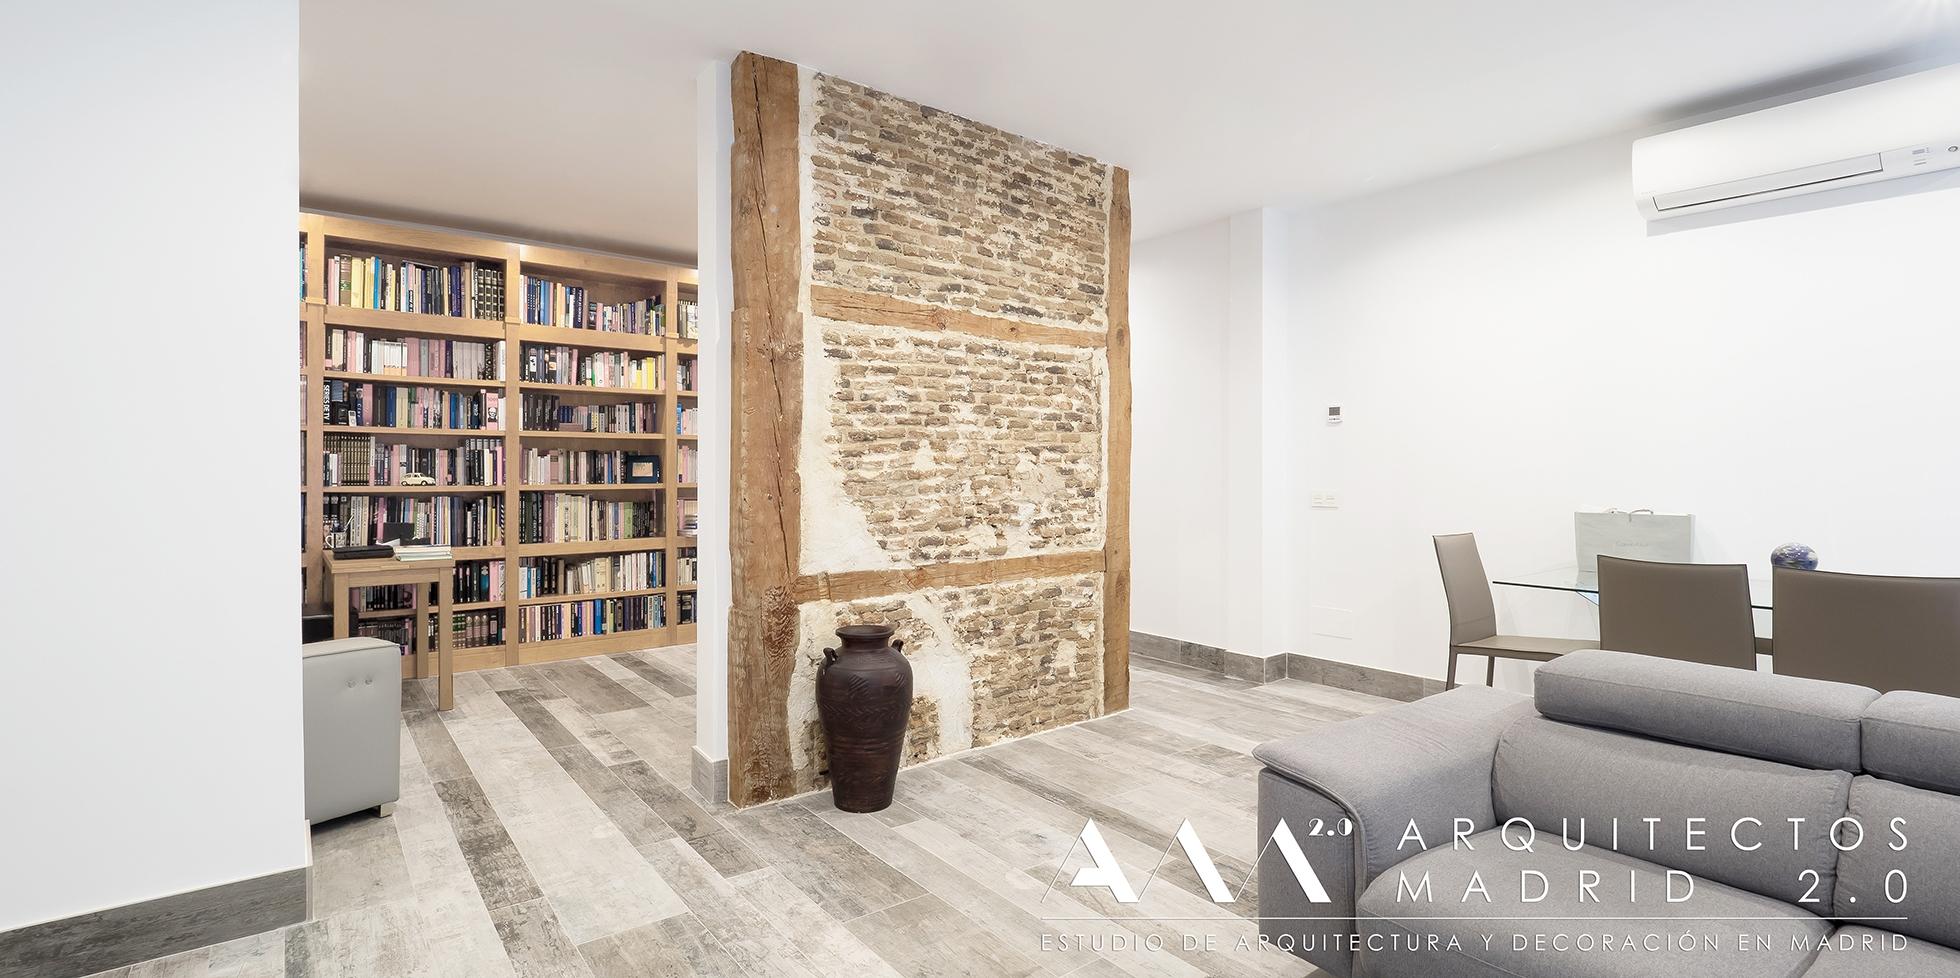 reforma-integral-vivienda-malasana-madrid-centro-casco-antiguo-03